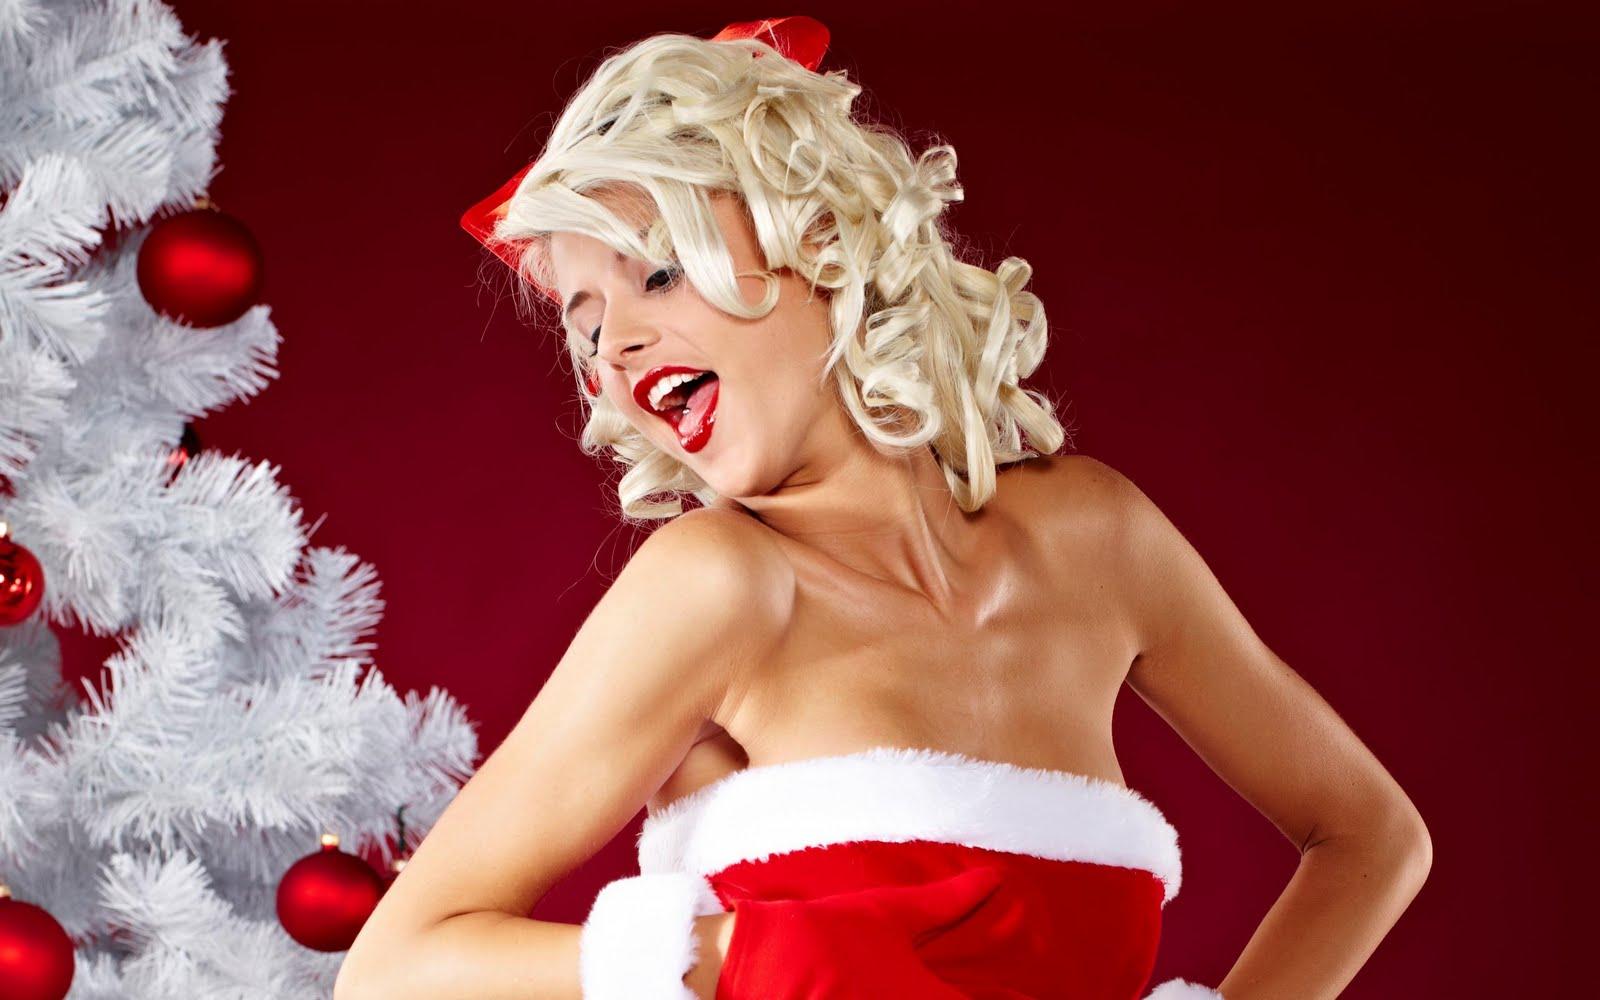 http://1.bp.blogspot.com/-nCS8TRcMl4M/TvWZo7_-nYI/AAAAAAAAL_M/hiVcxeuhnGc/s1600/Santa_Clause_Girl_Merry_Christmas_red_lips.jpg